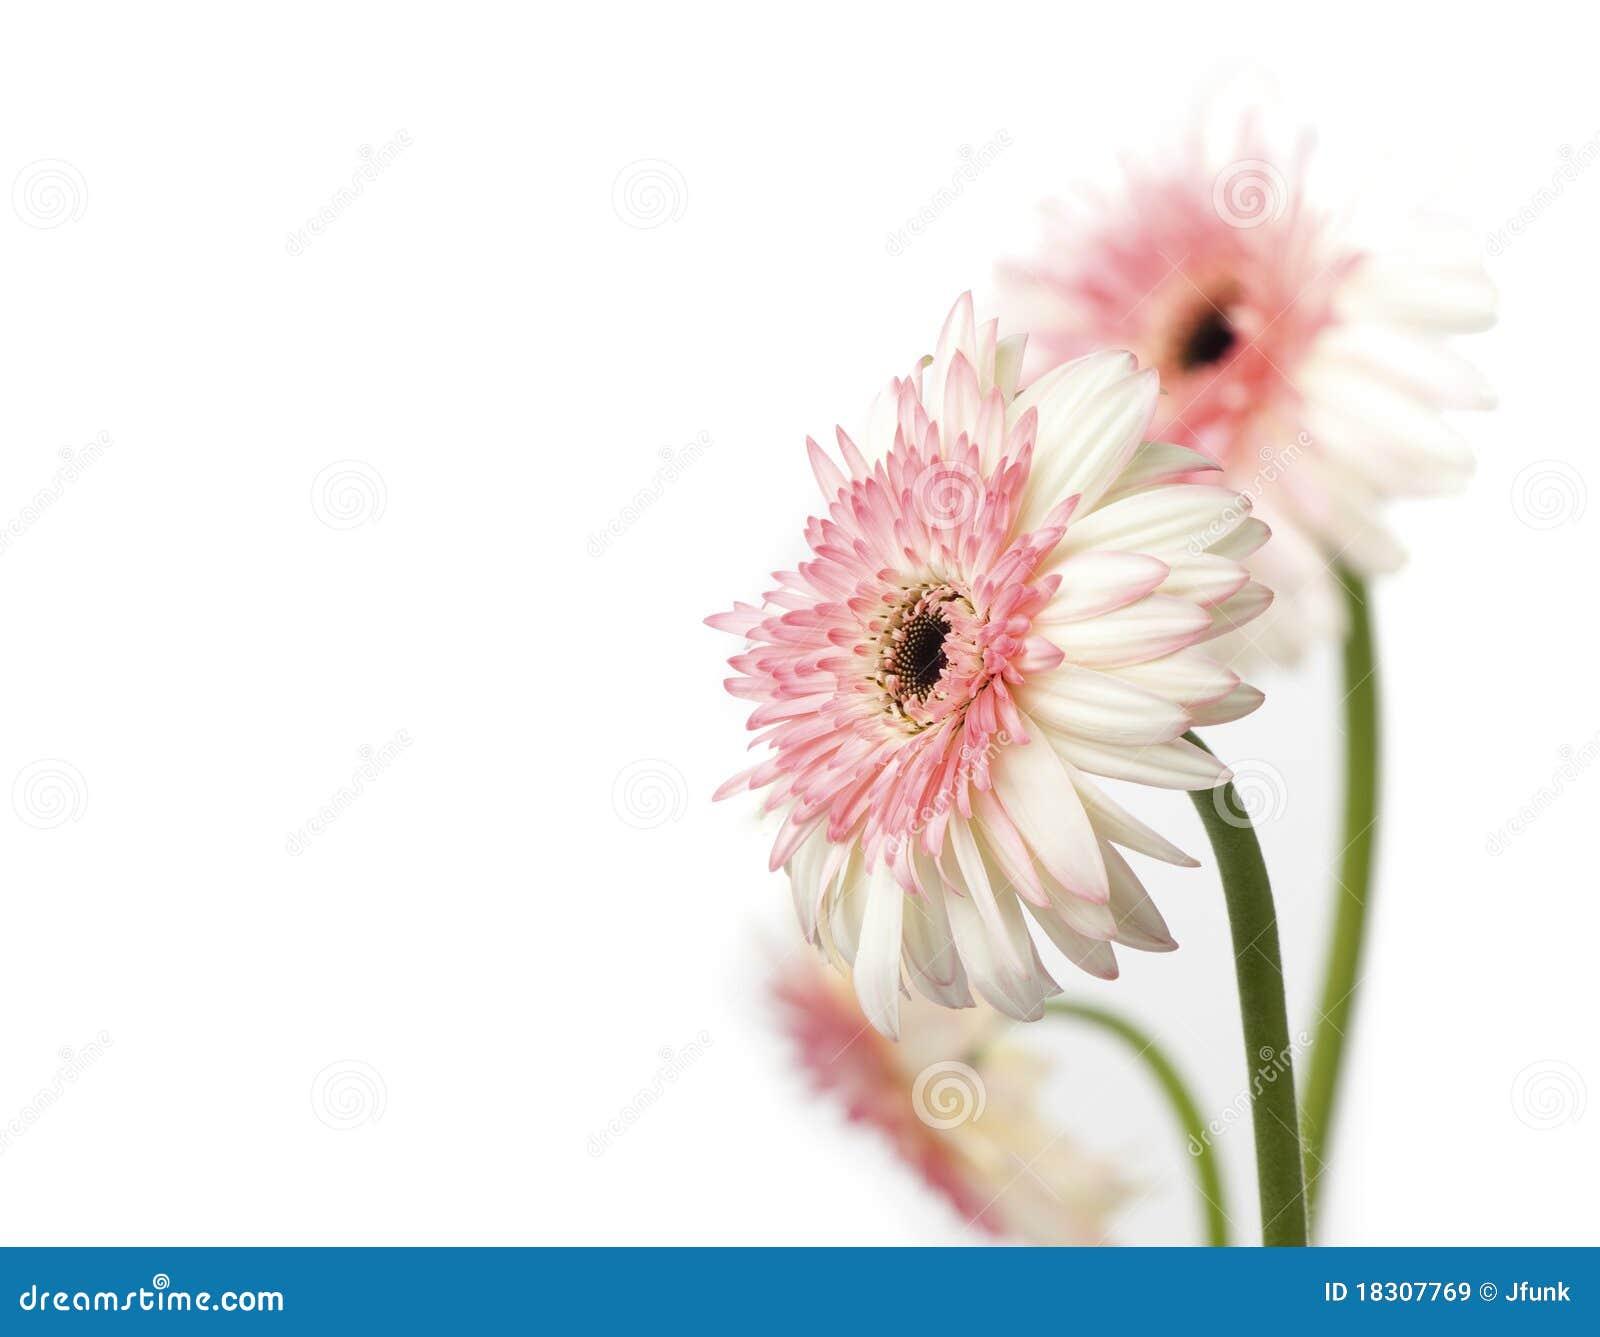 Pink and white Gerbera Daisies